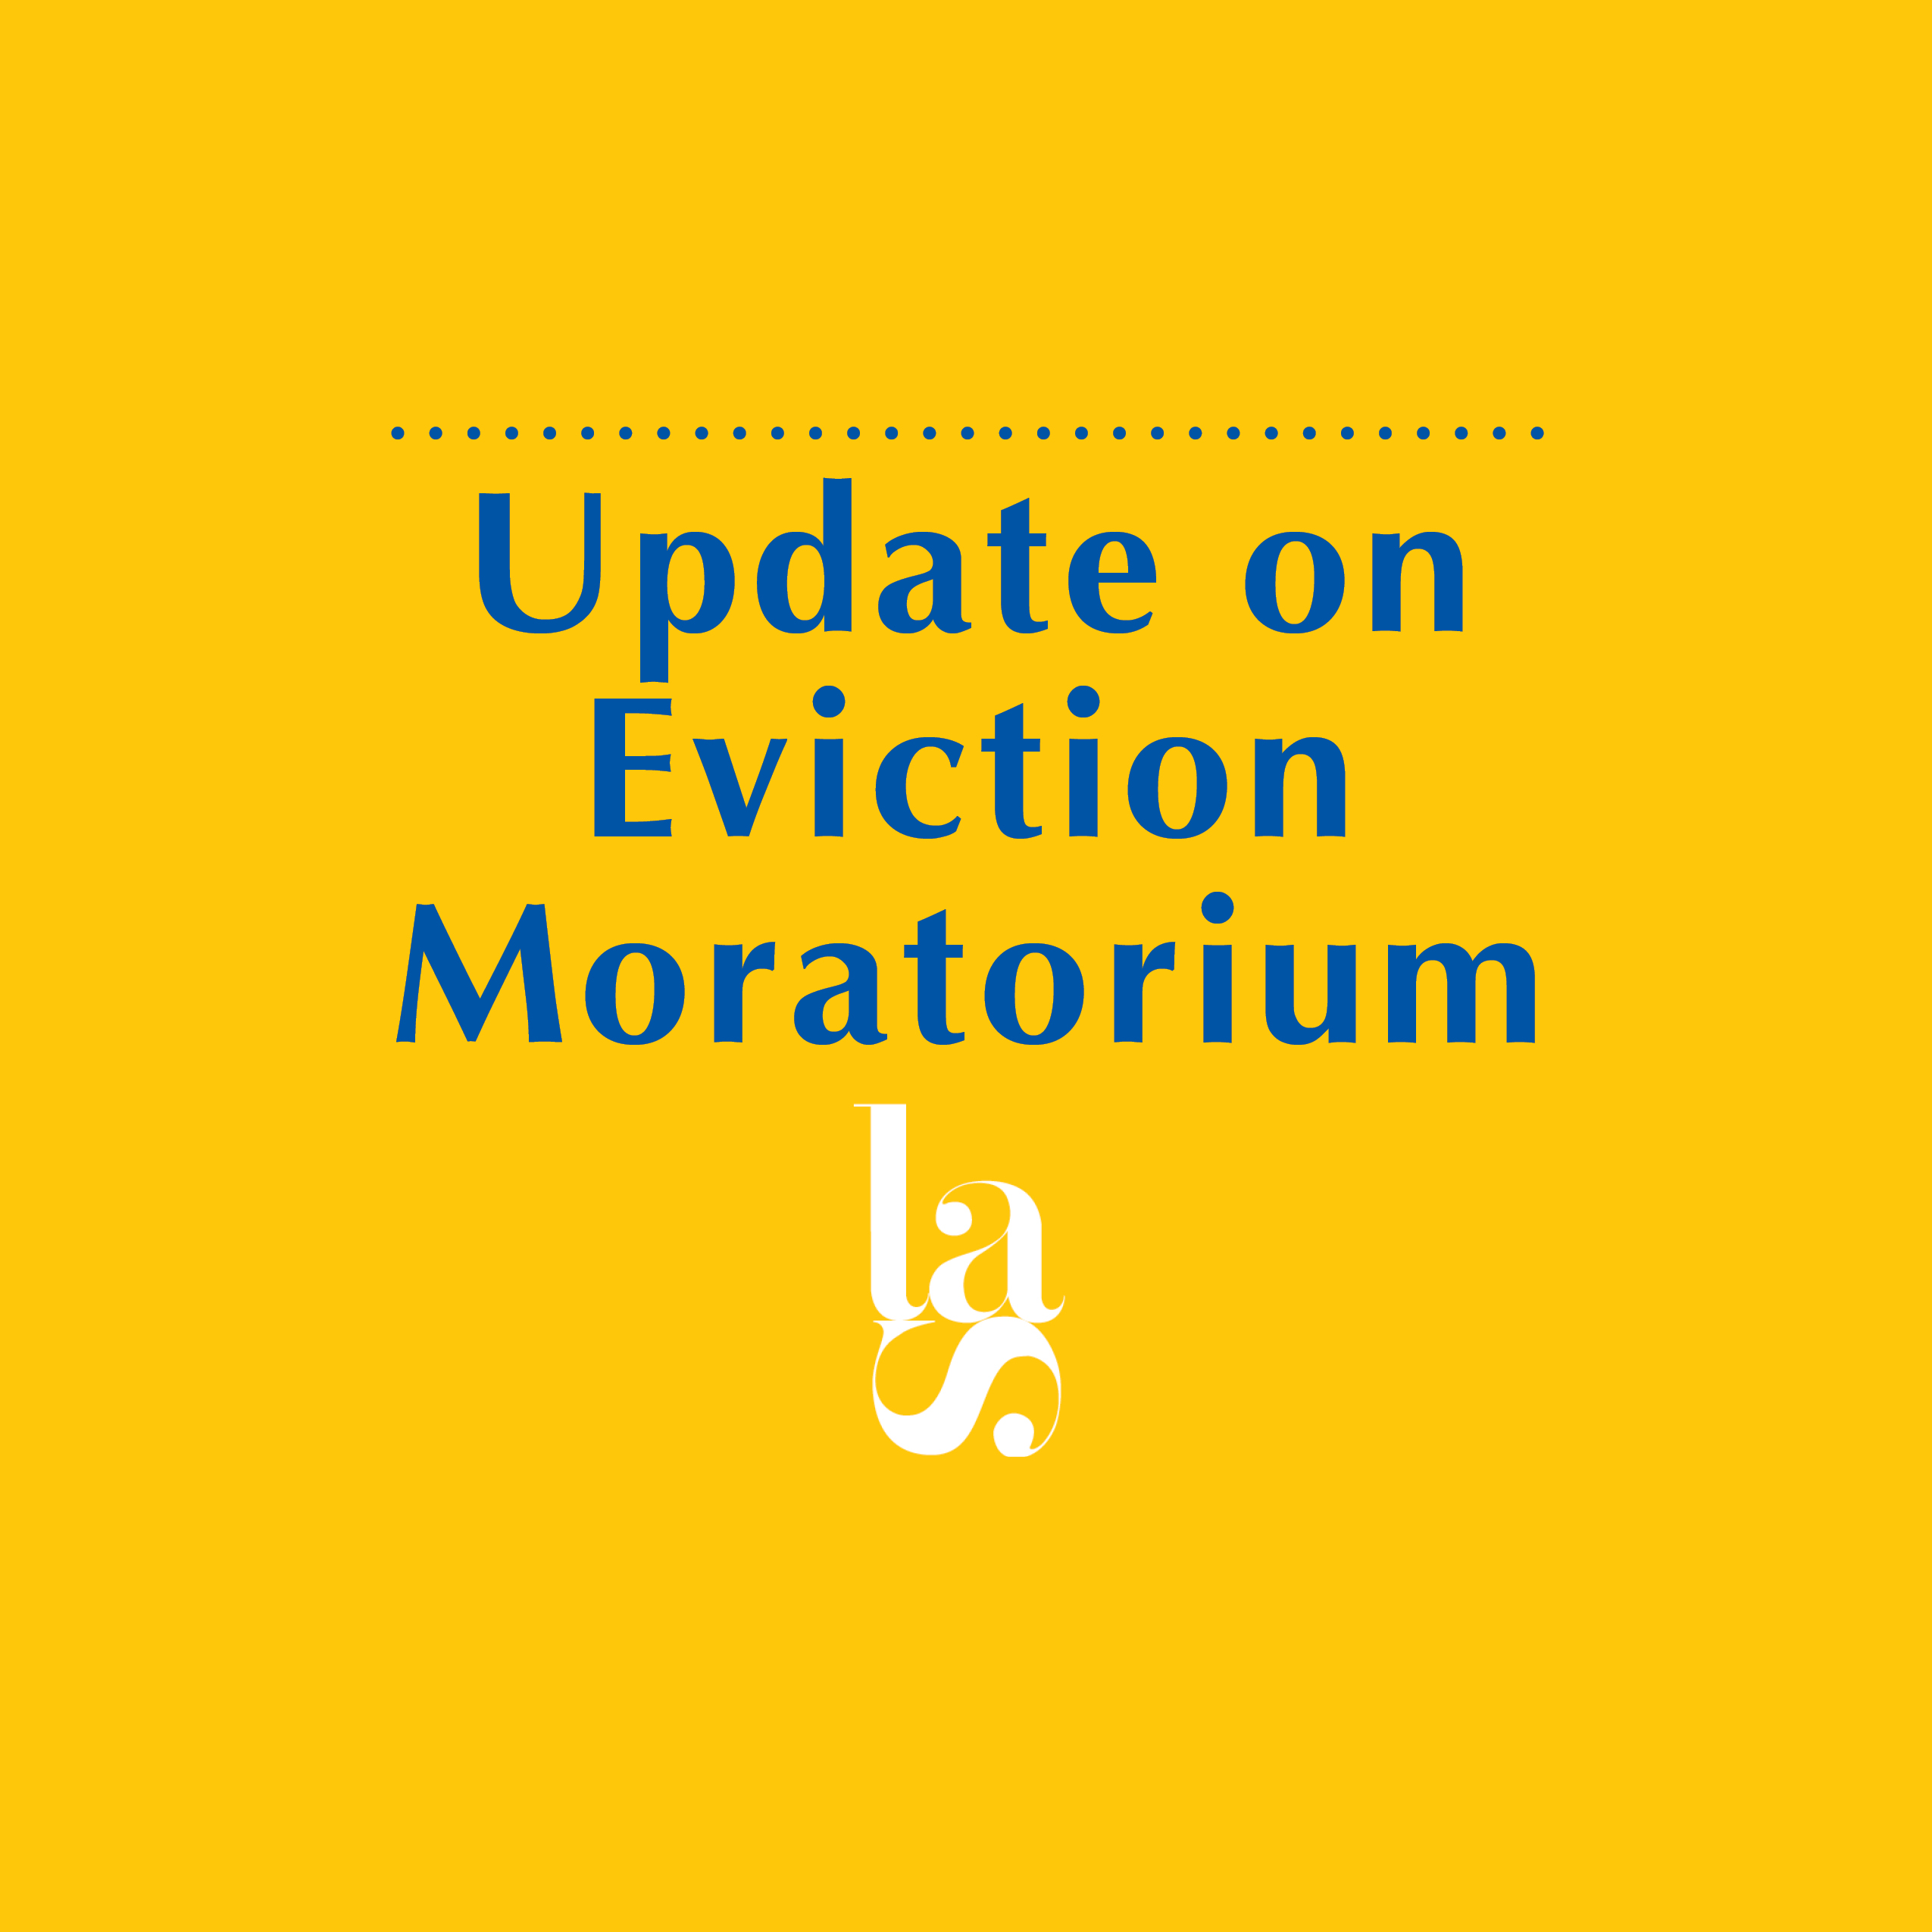 Update on Eviction Moratorium